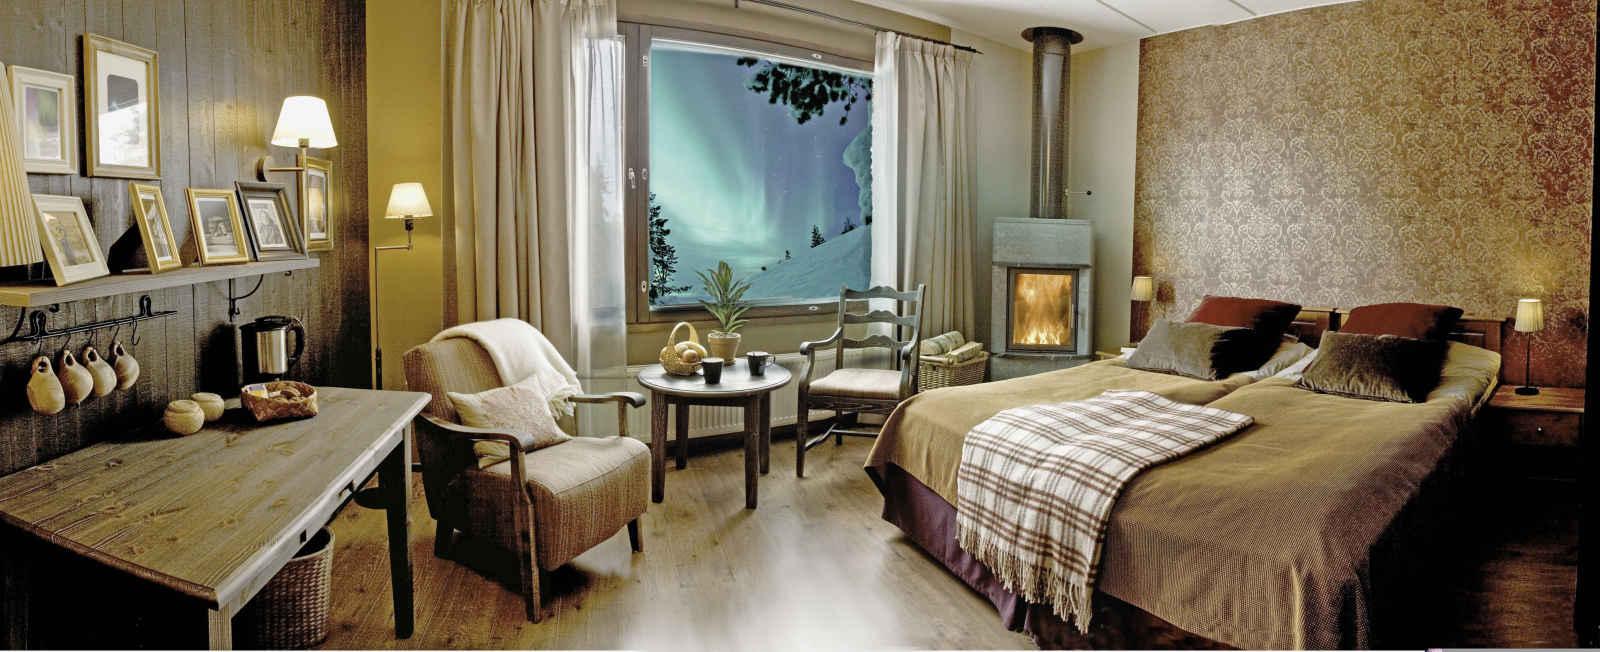 Santa's Hotel Aurora 5 jours / 4 nuits